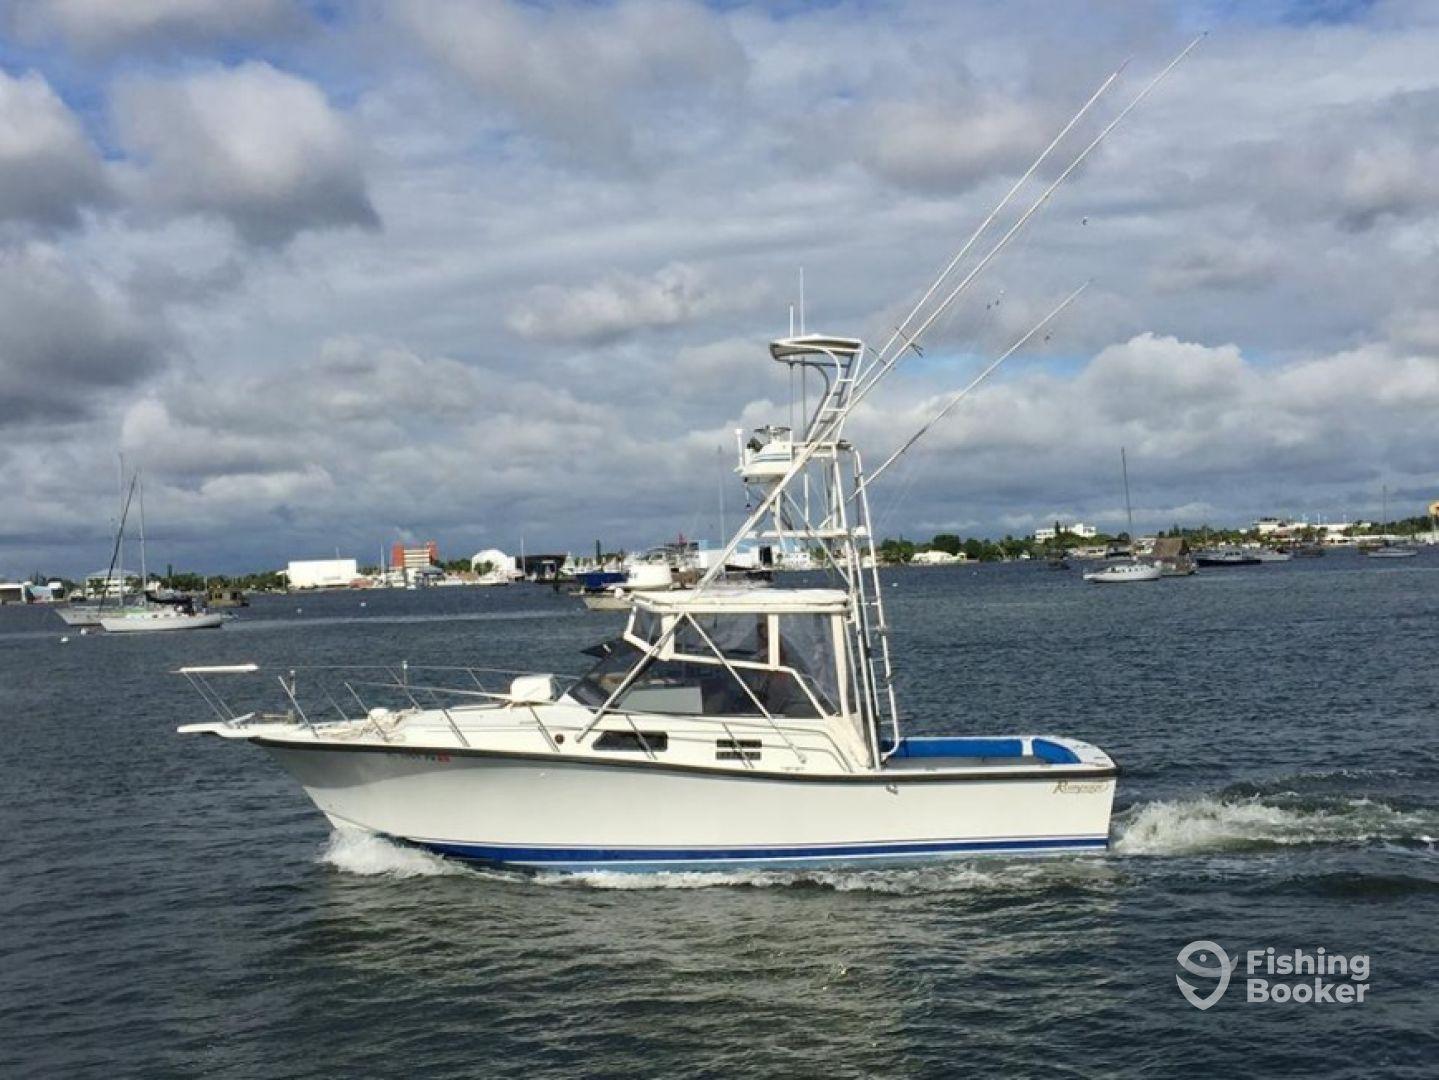 Tuna wahoo fishing charters palm beach shores fl for Fishing charters west palm beach fl